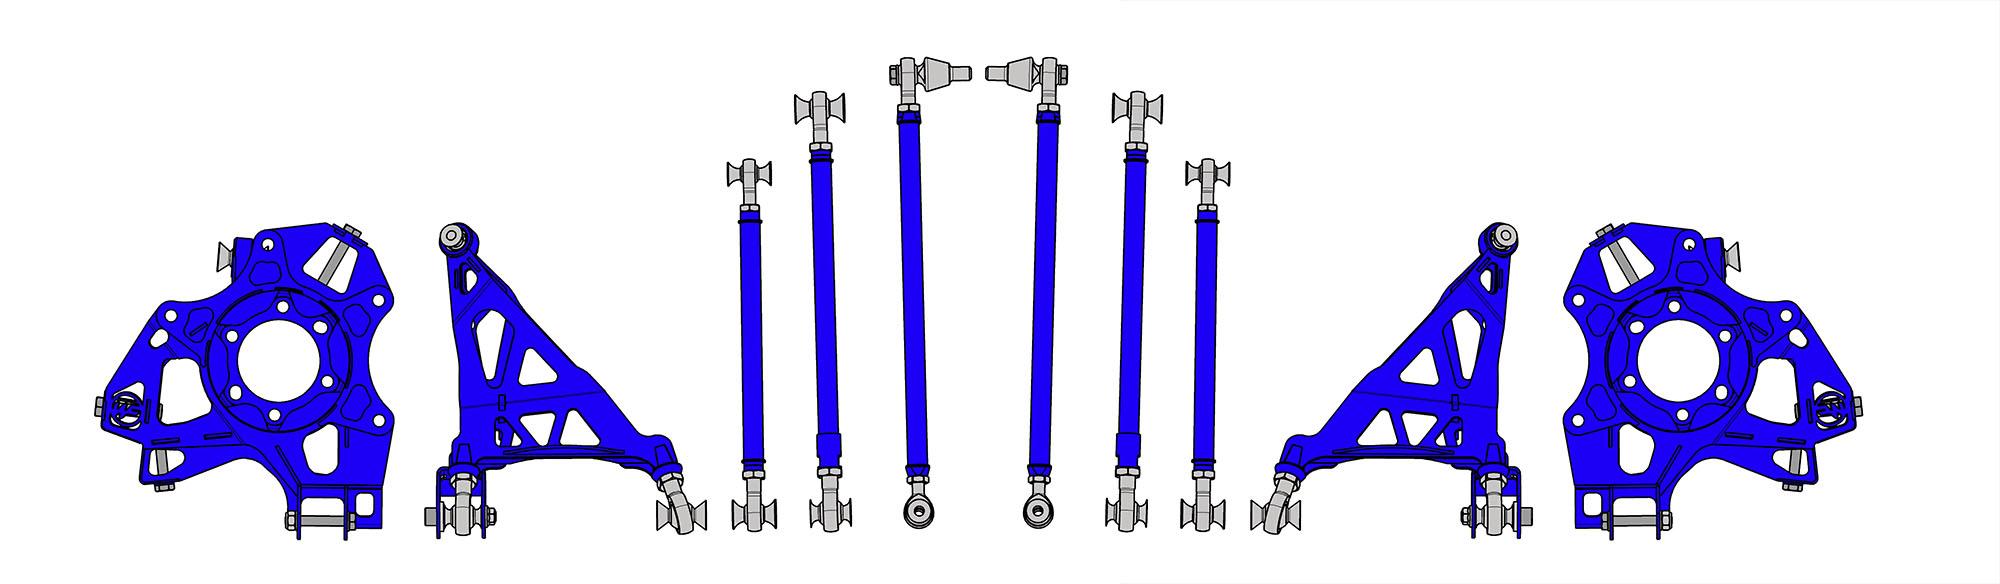 Wisefab rear suspension kit for Nissan 350Z